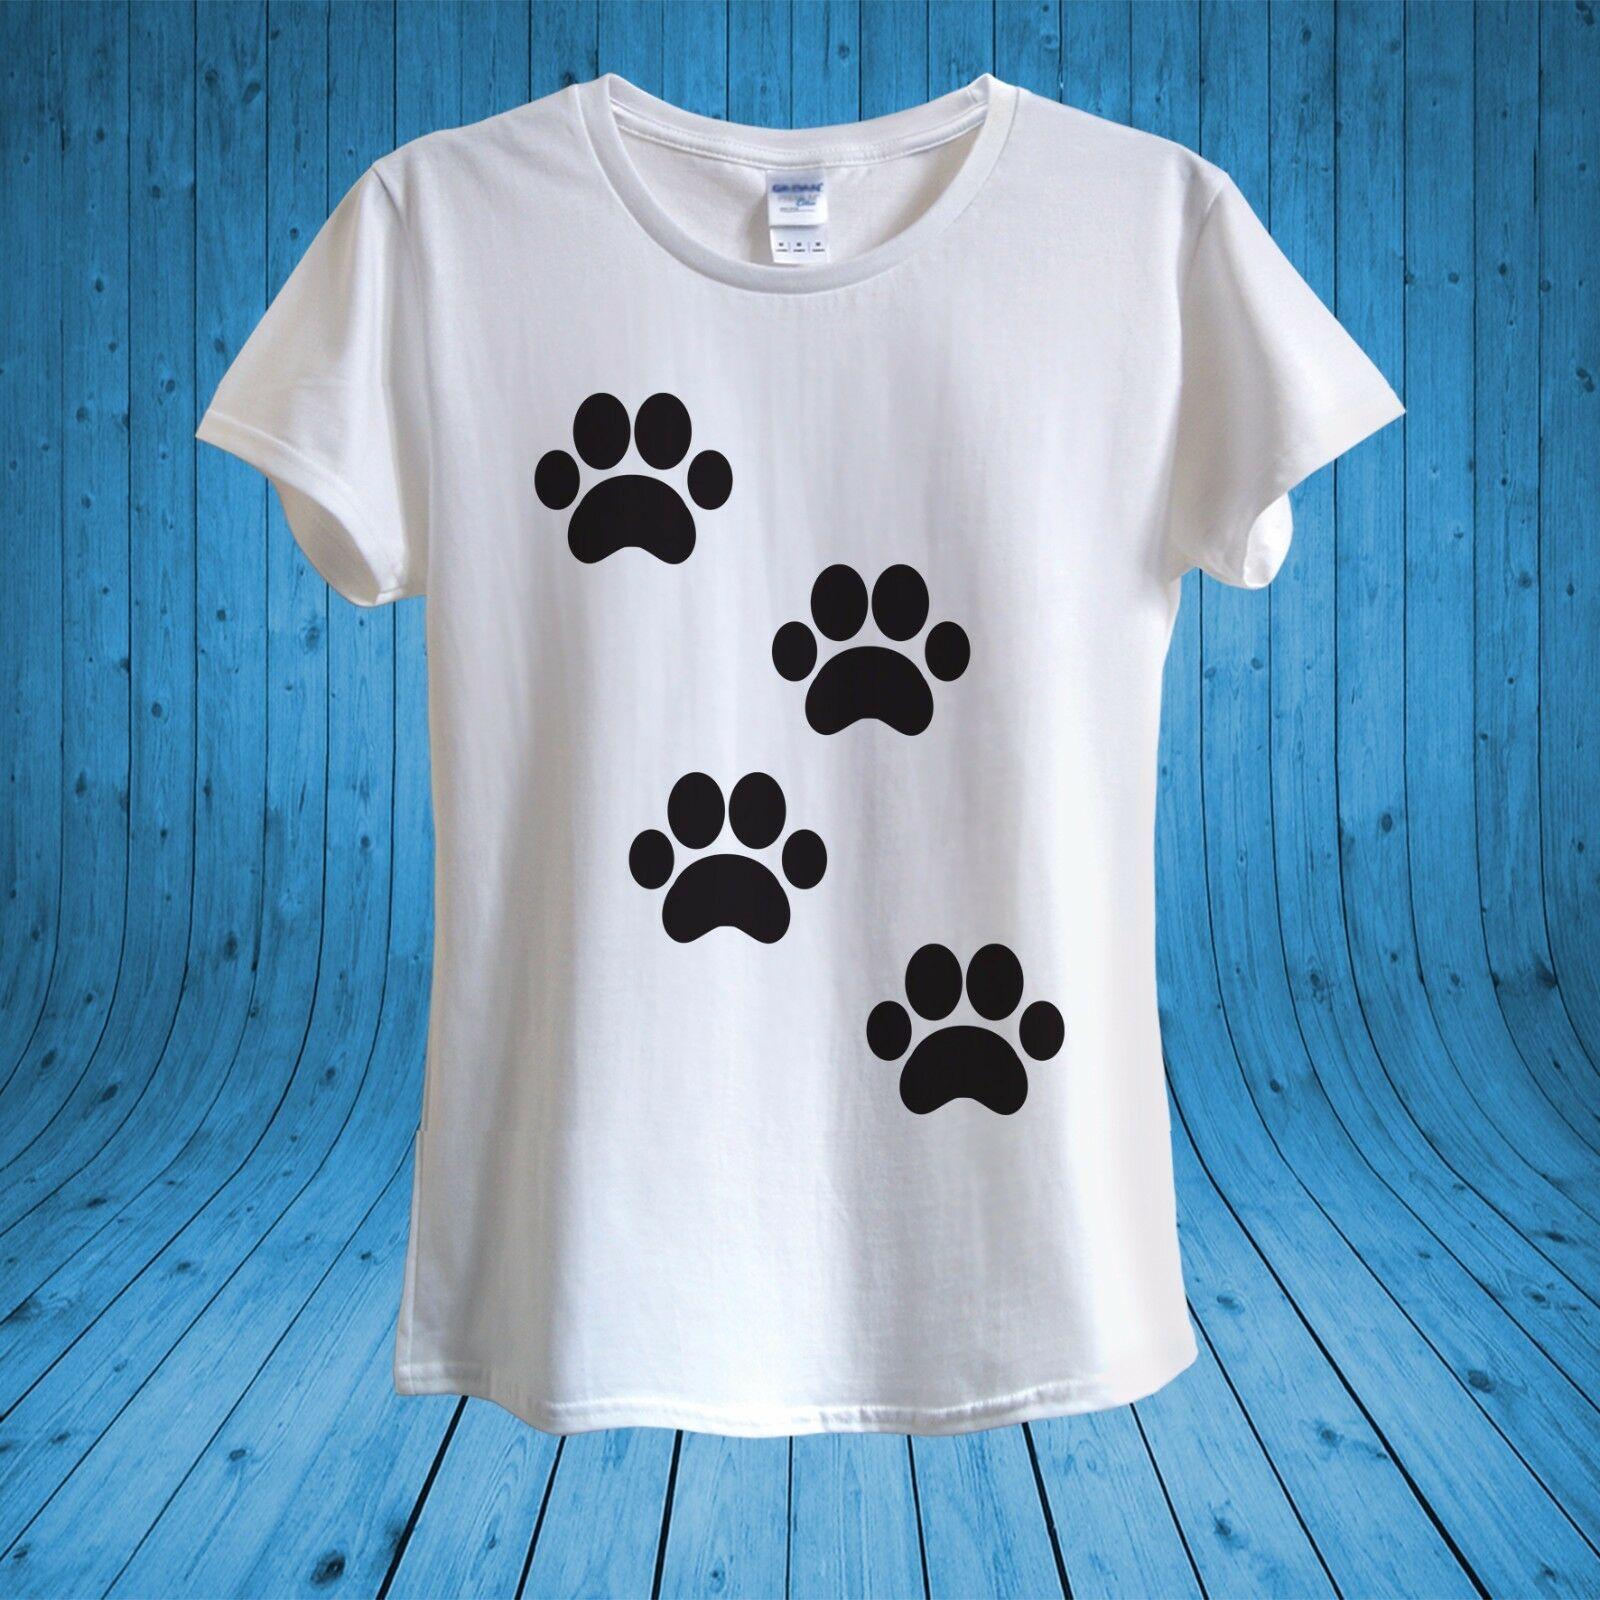 6c5fa6447 Cute Cat Paw prints Kitty Love Cats T-shirt hoodie hip hop t-shirt jacket  croatia leather tshirt denim clothes camiseta t shirt